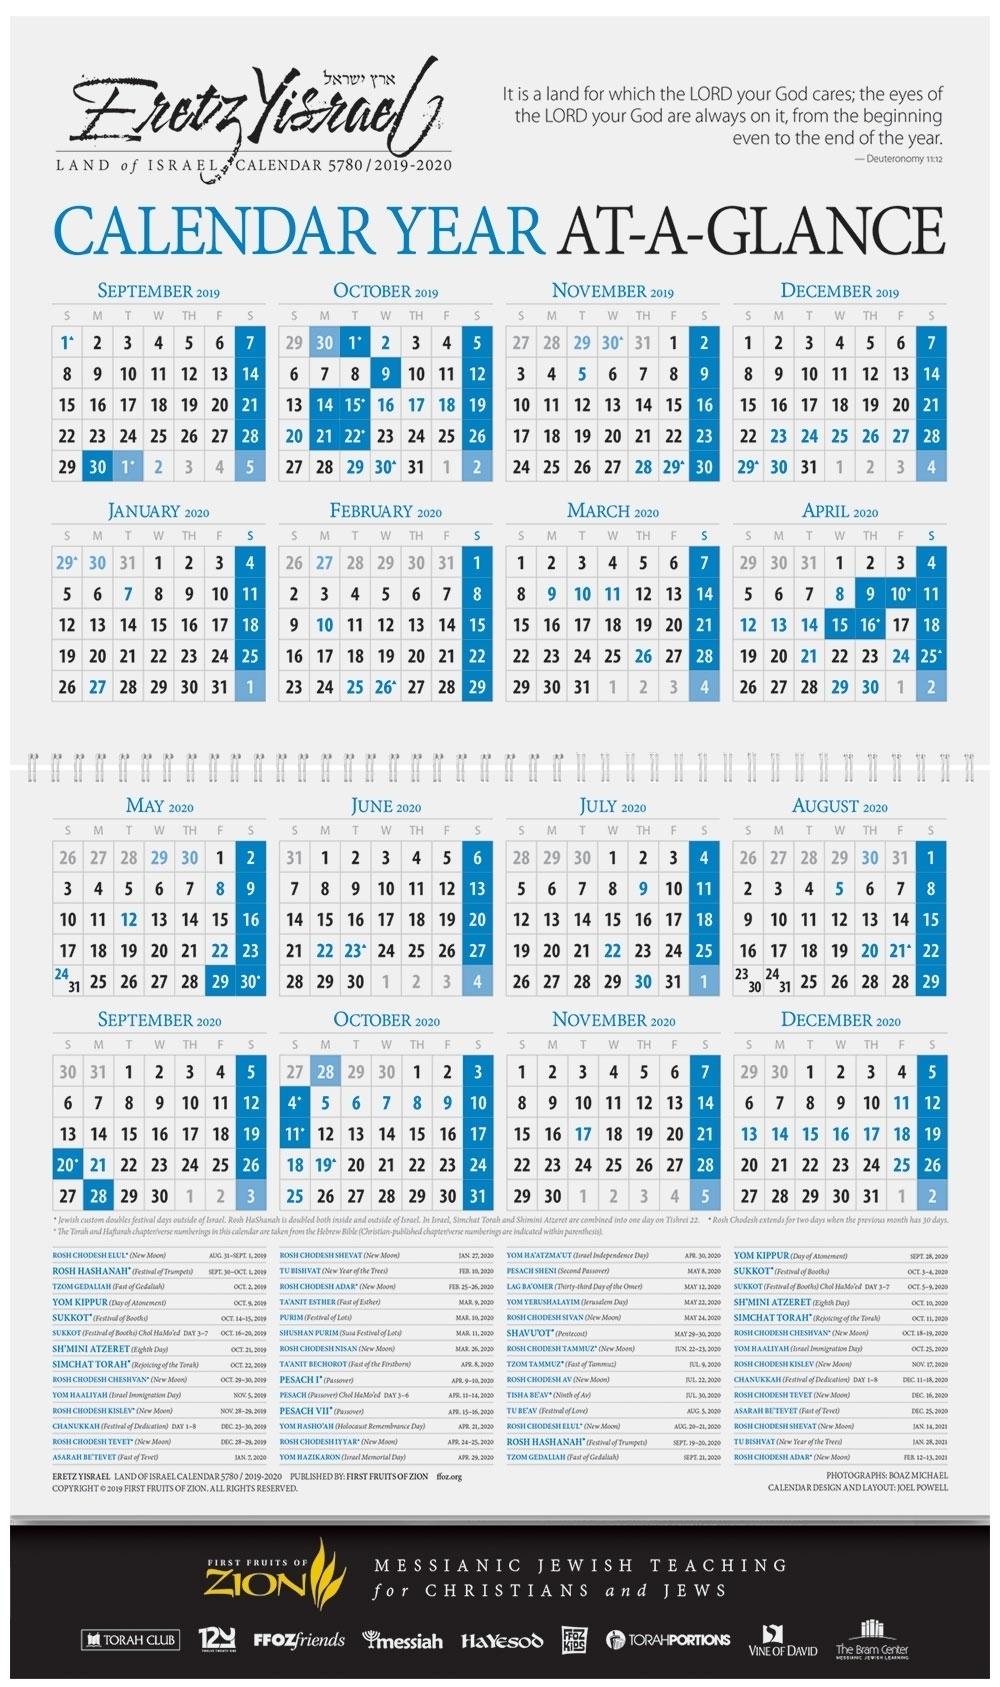 Weekly Torah Parsha Calendar For 2019/2020 - Calendar for This Week's Torah Portion 2019